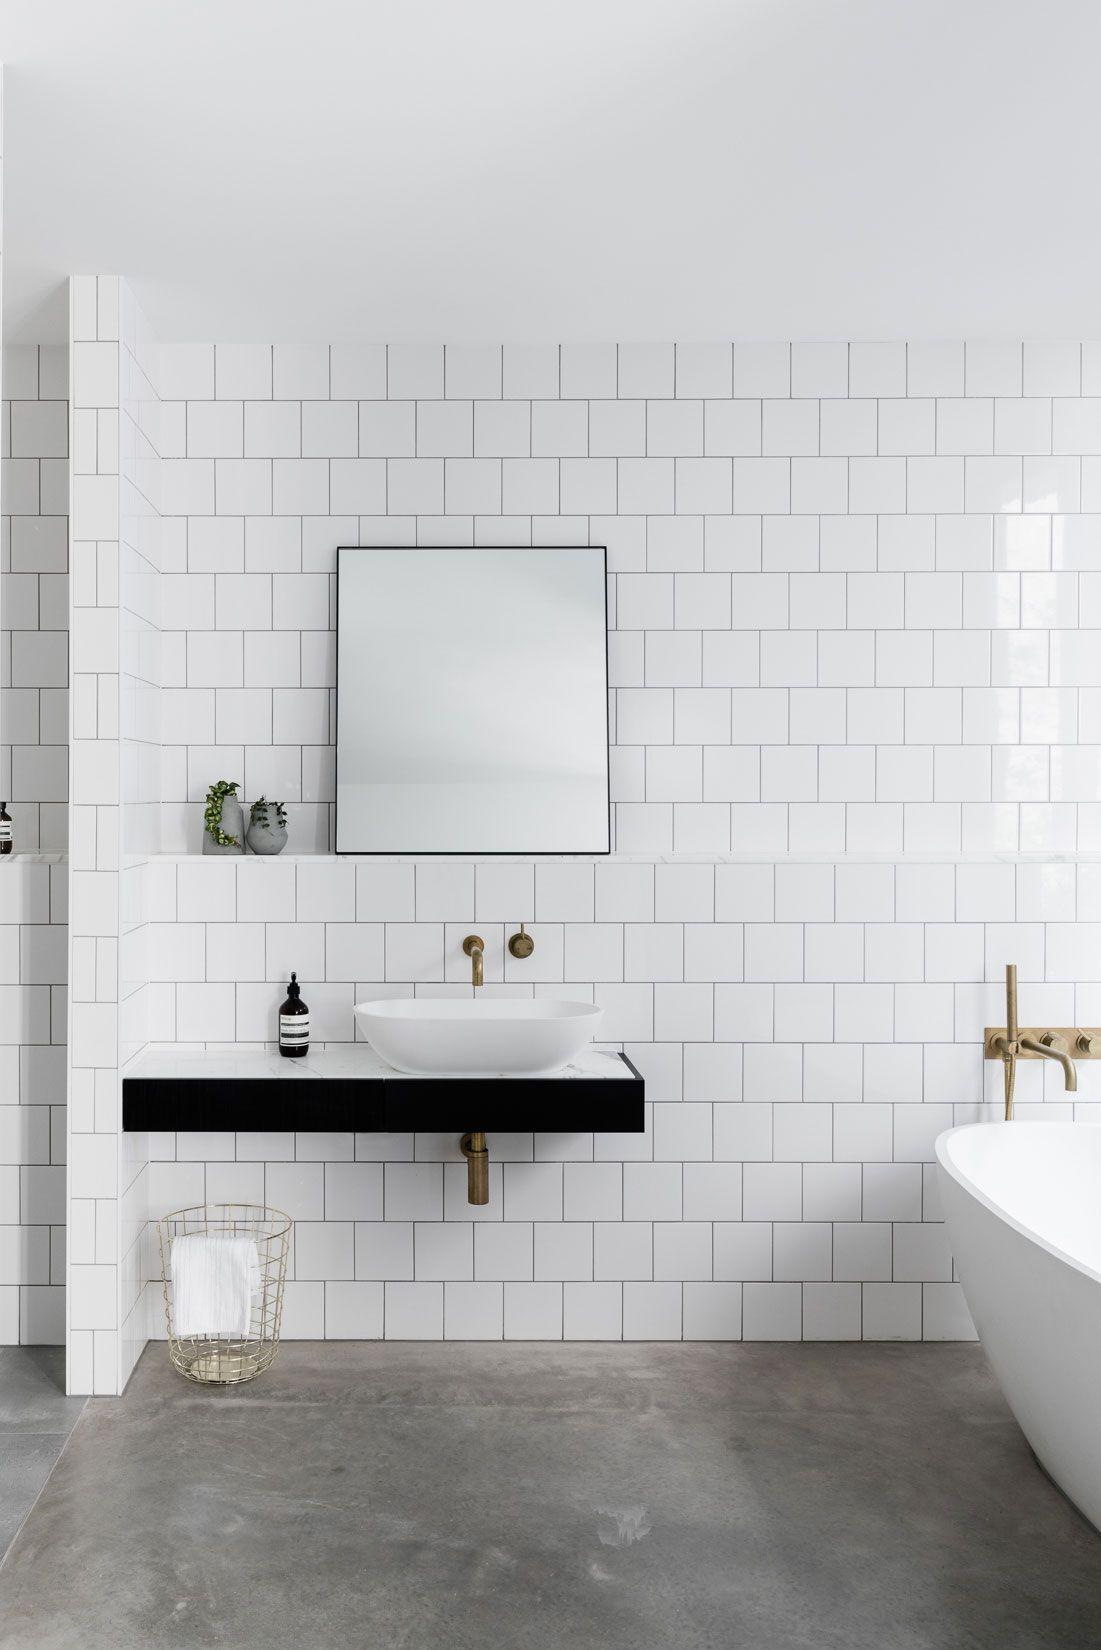 7 Amazing Bathroom Design Ideas (That Will Trend In 2018 ...